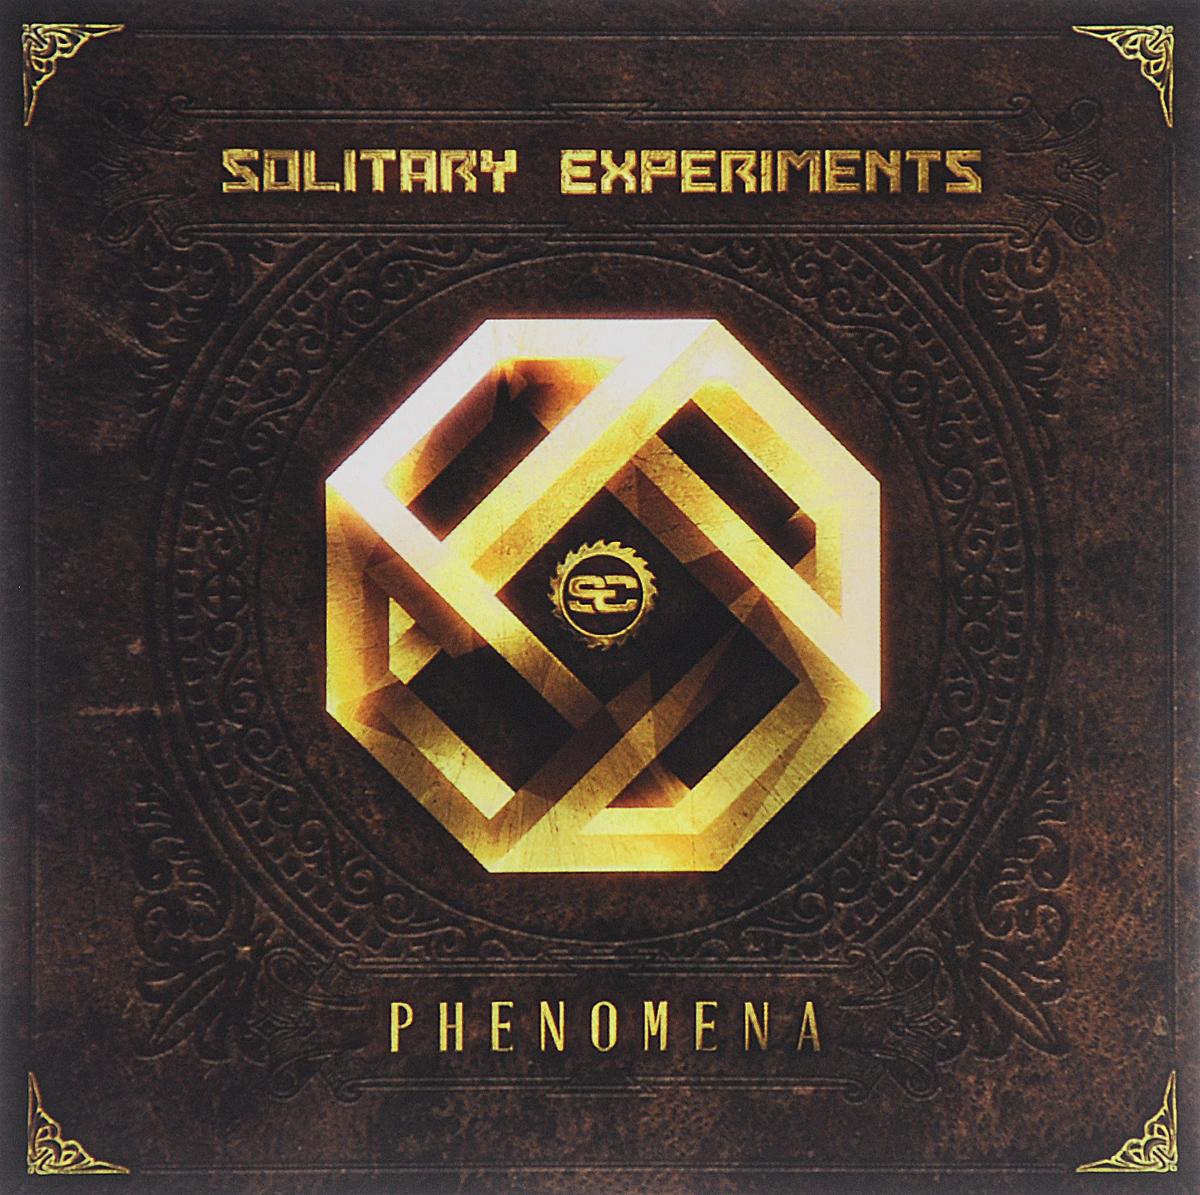 Solitary Experiments Solitary Experiments. Phenomena ciro marchetti tarot of dreams таро снов набор 83 карты с книгой на английском языке